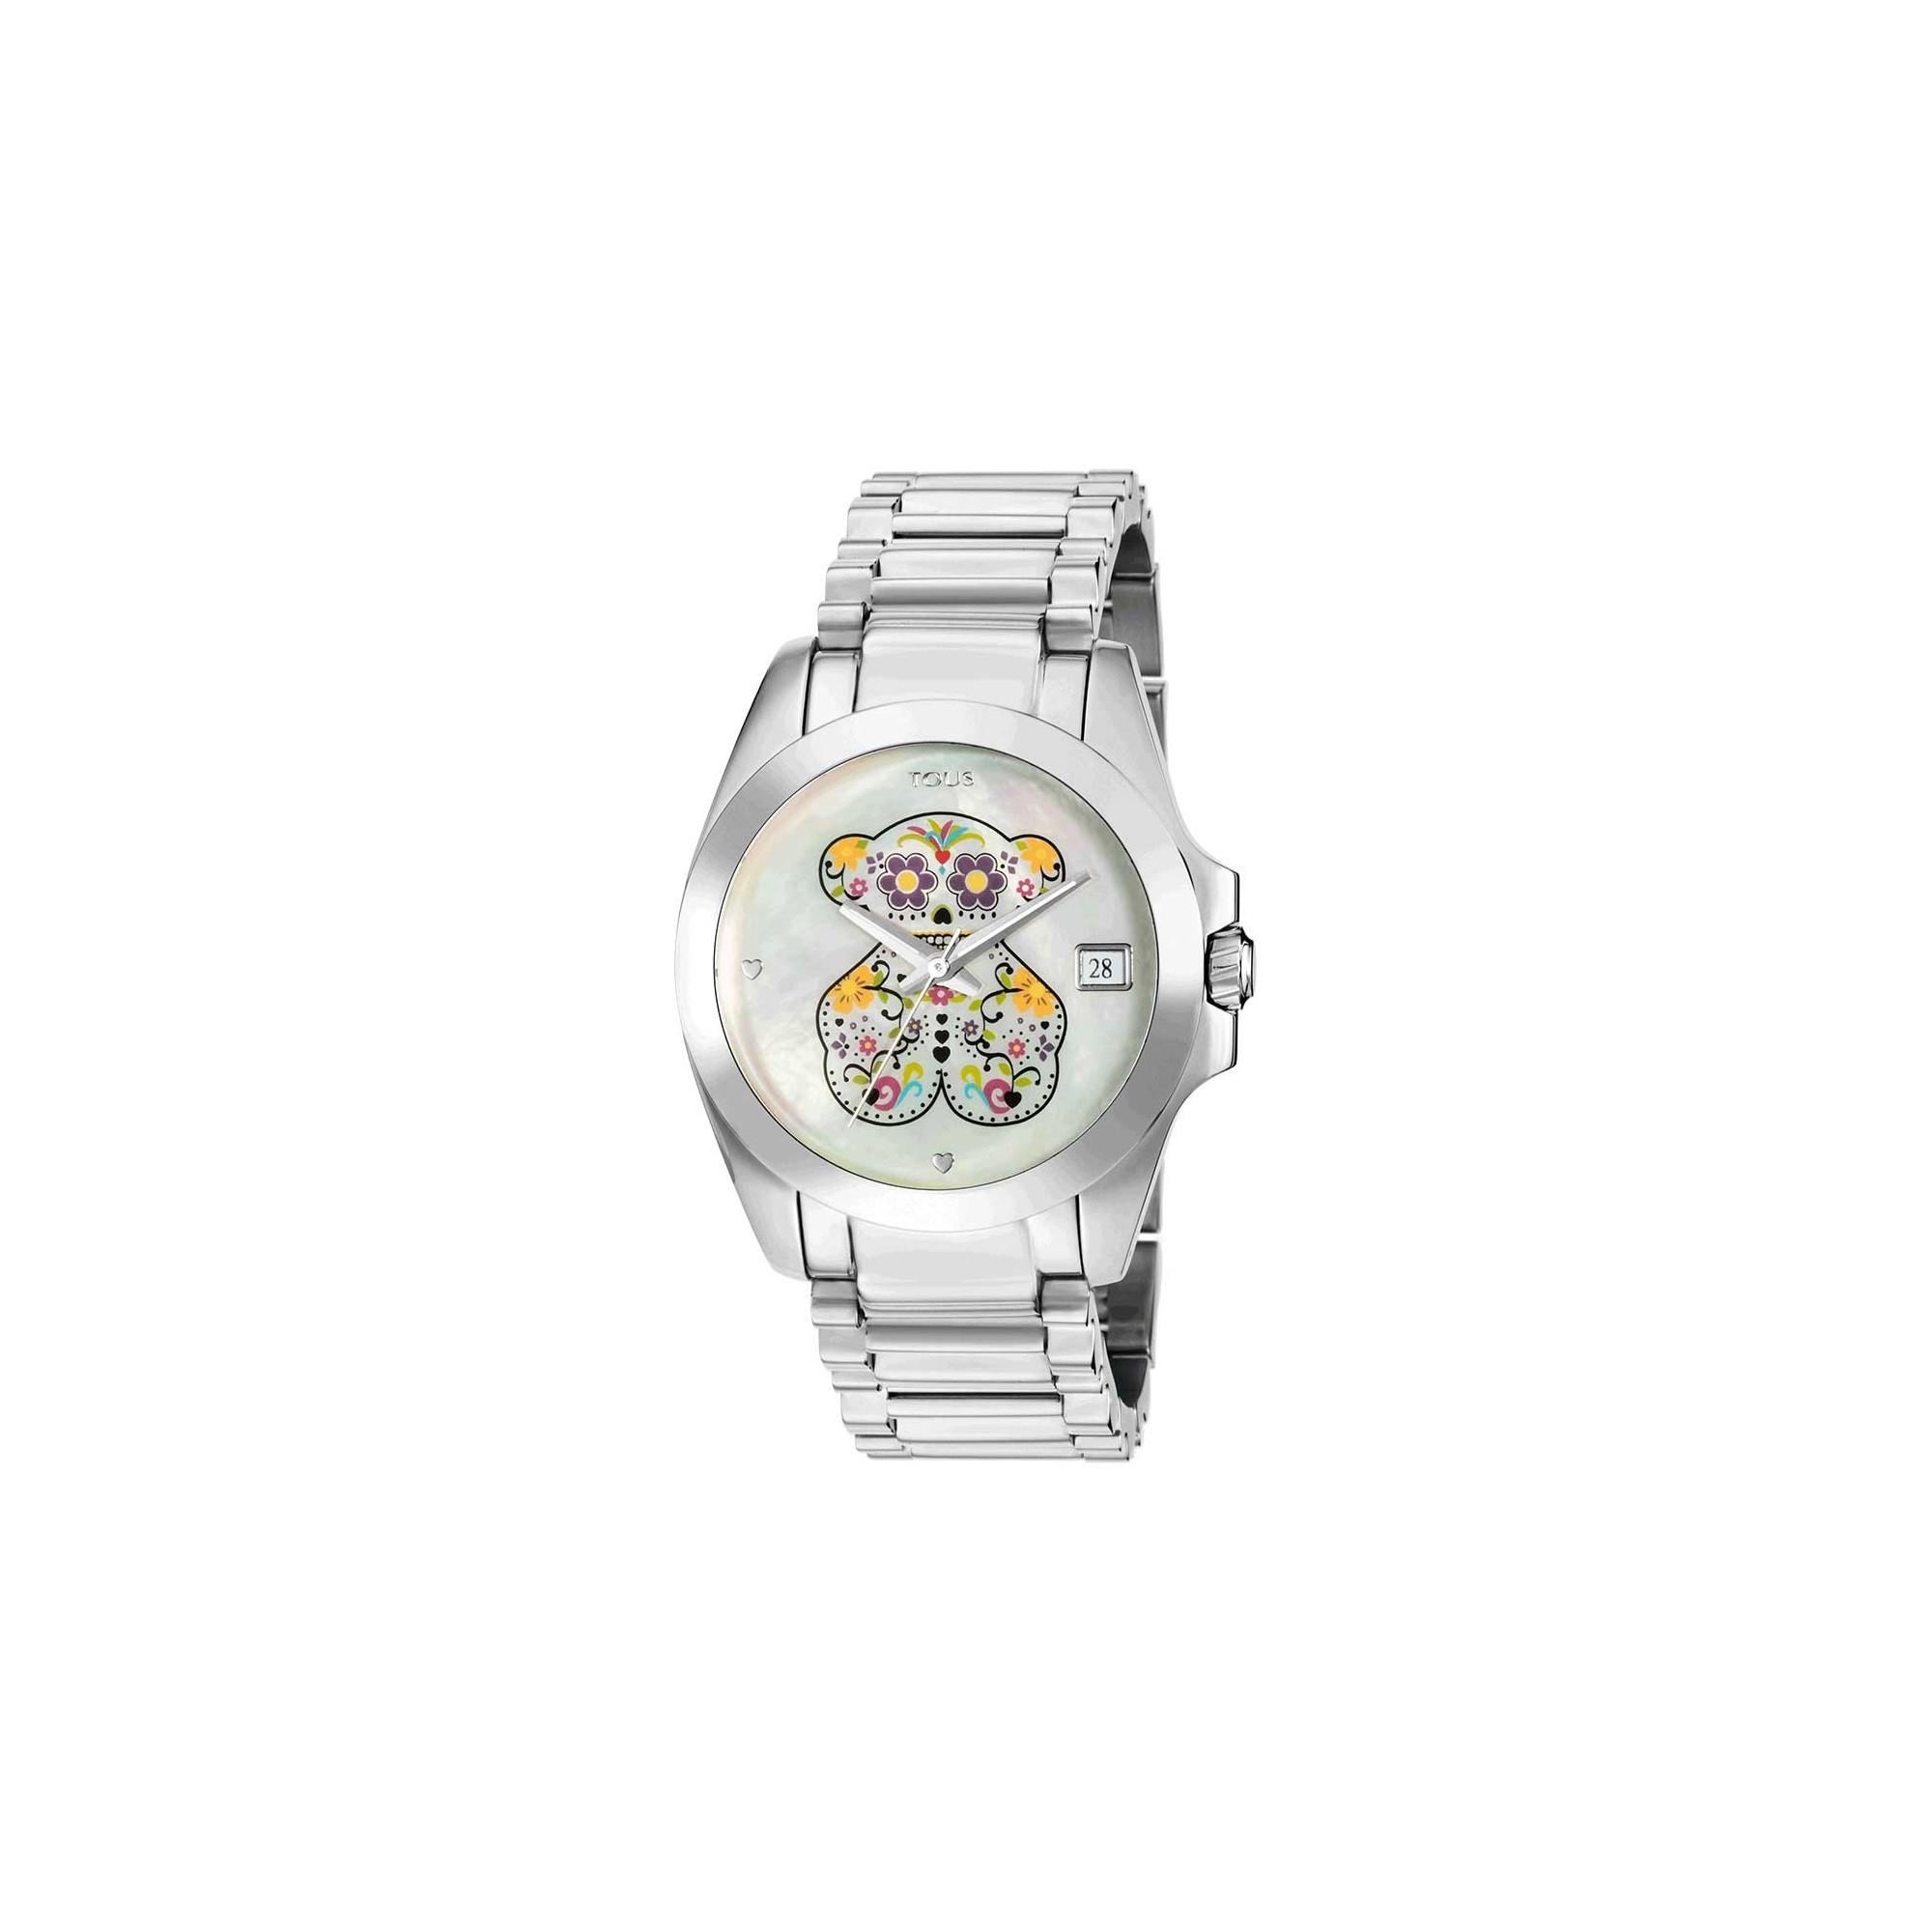 8b51aad77e6b Reloj Tous Chica Drive Sugar Brazalete Acero 500350230